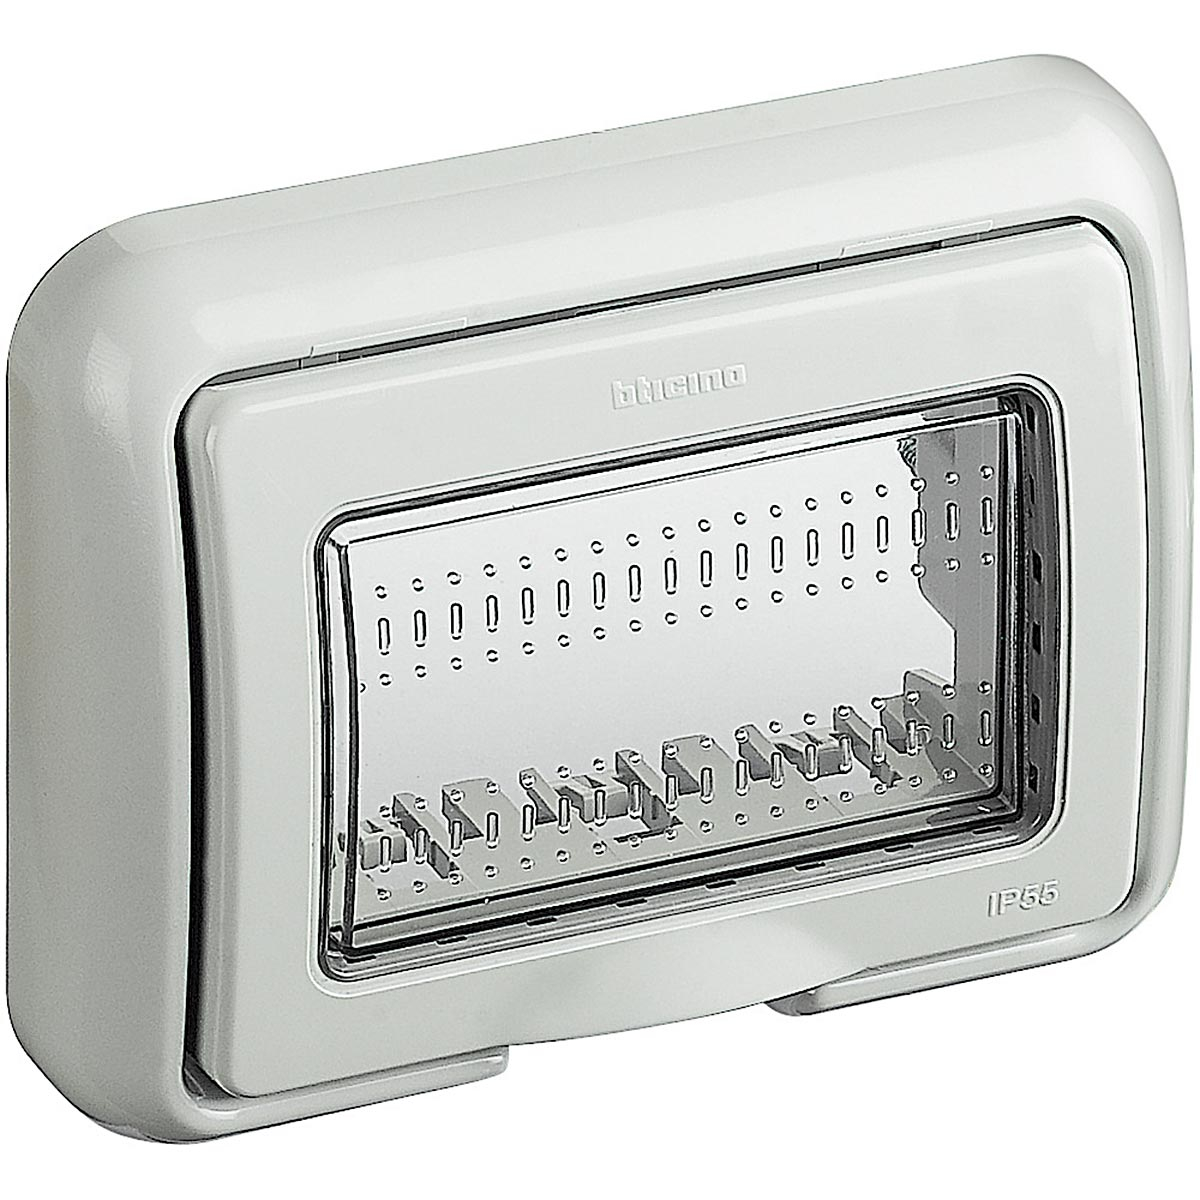 Matix bticino coperchio idrobox ip55 3 posti colore grigio 25603